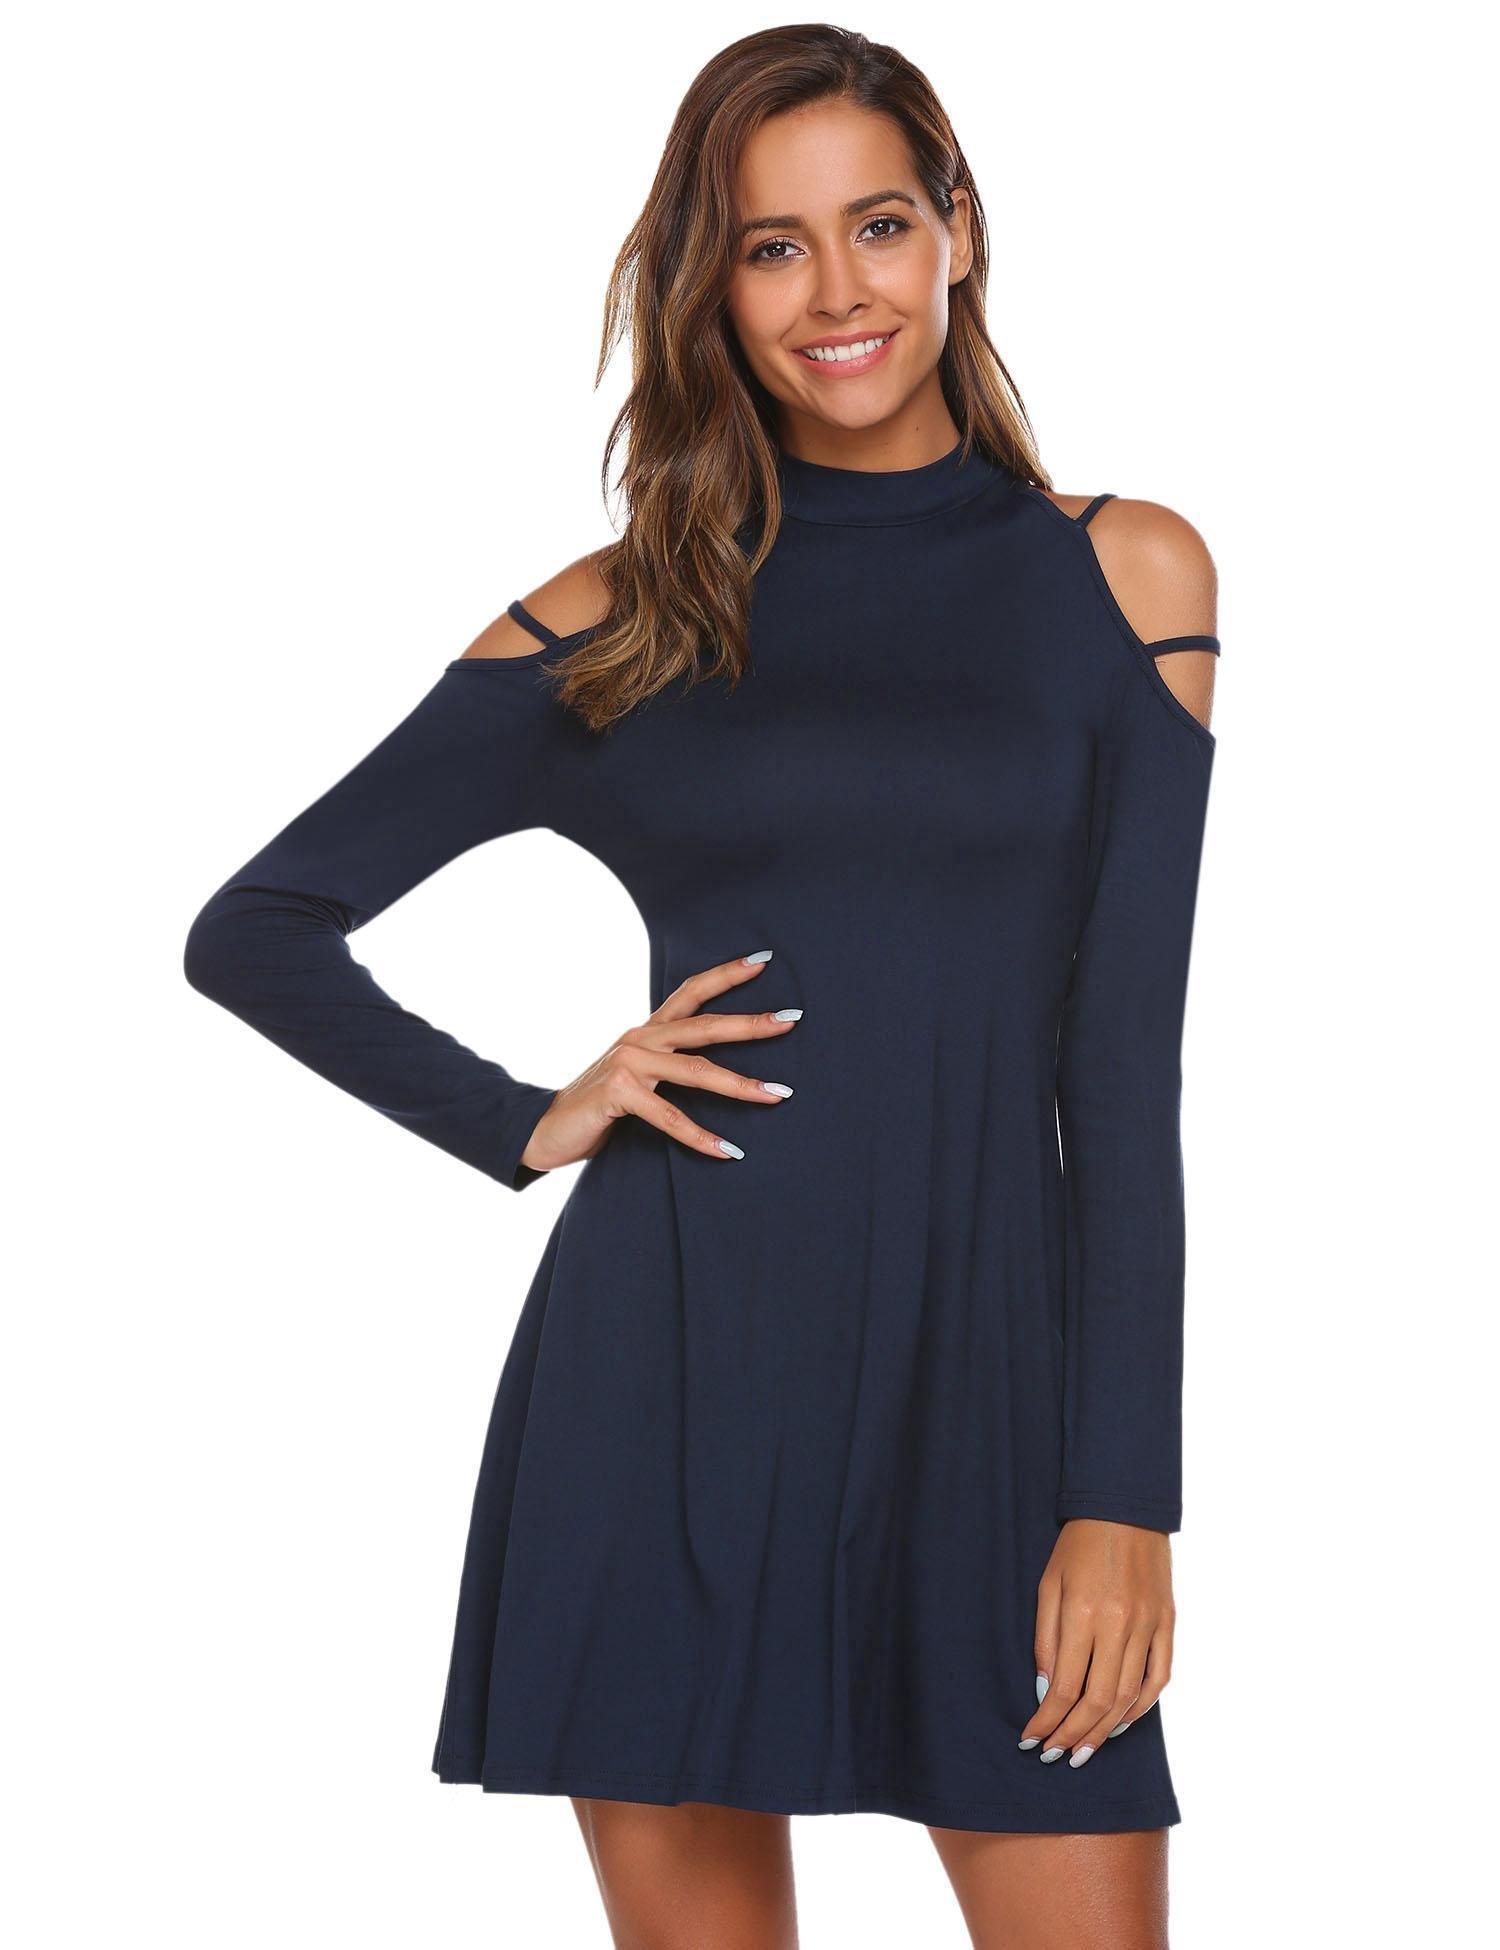 Misakia Women's Summer Cold Shoulder Tunic Top Swing T-Shirt Loose Dress (Navy Blue XL)